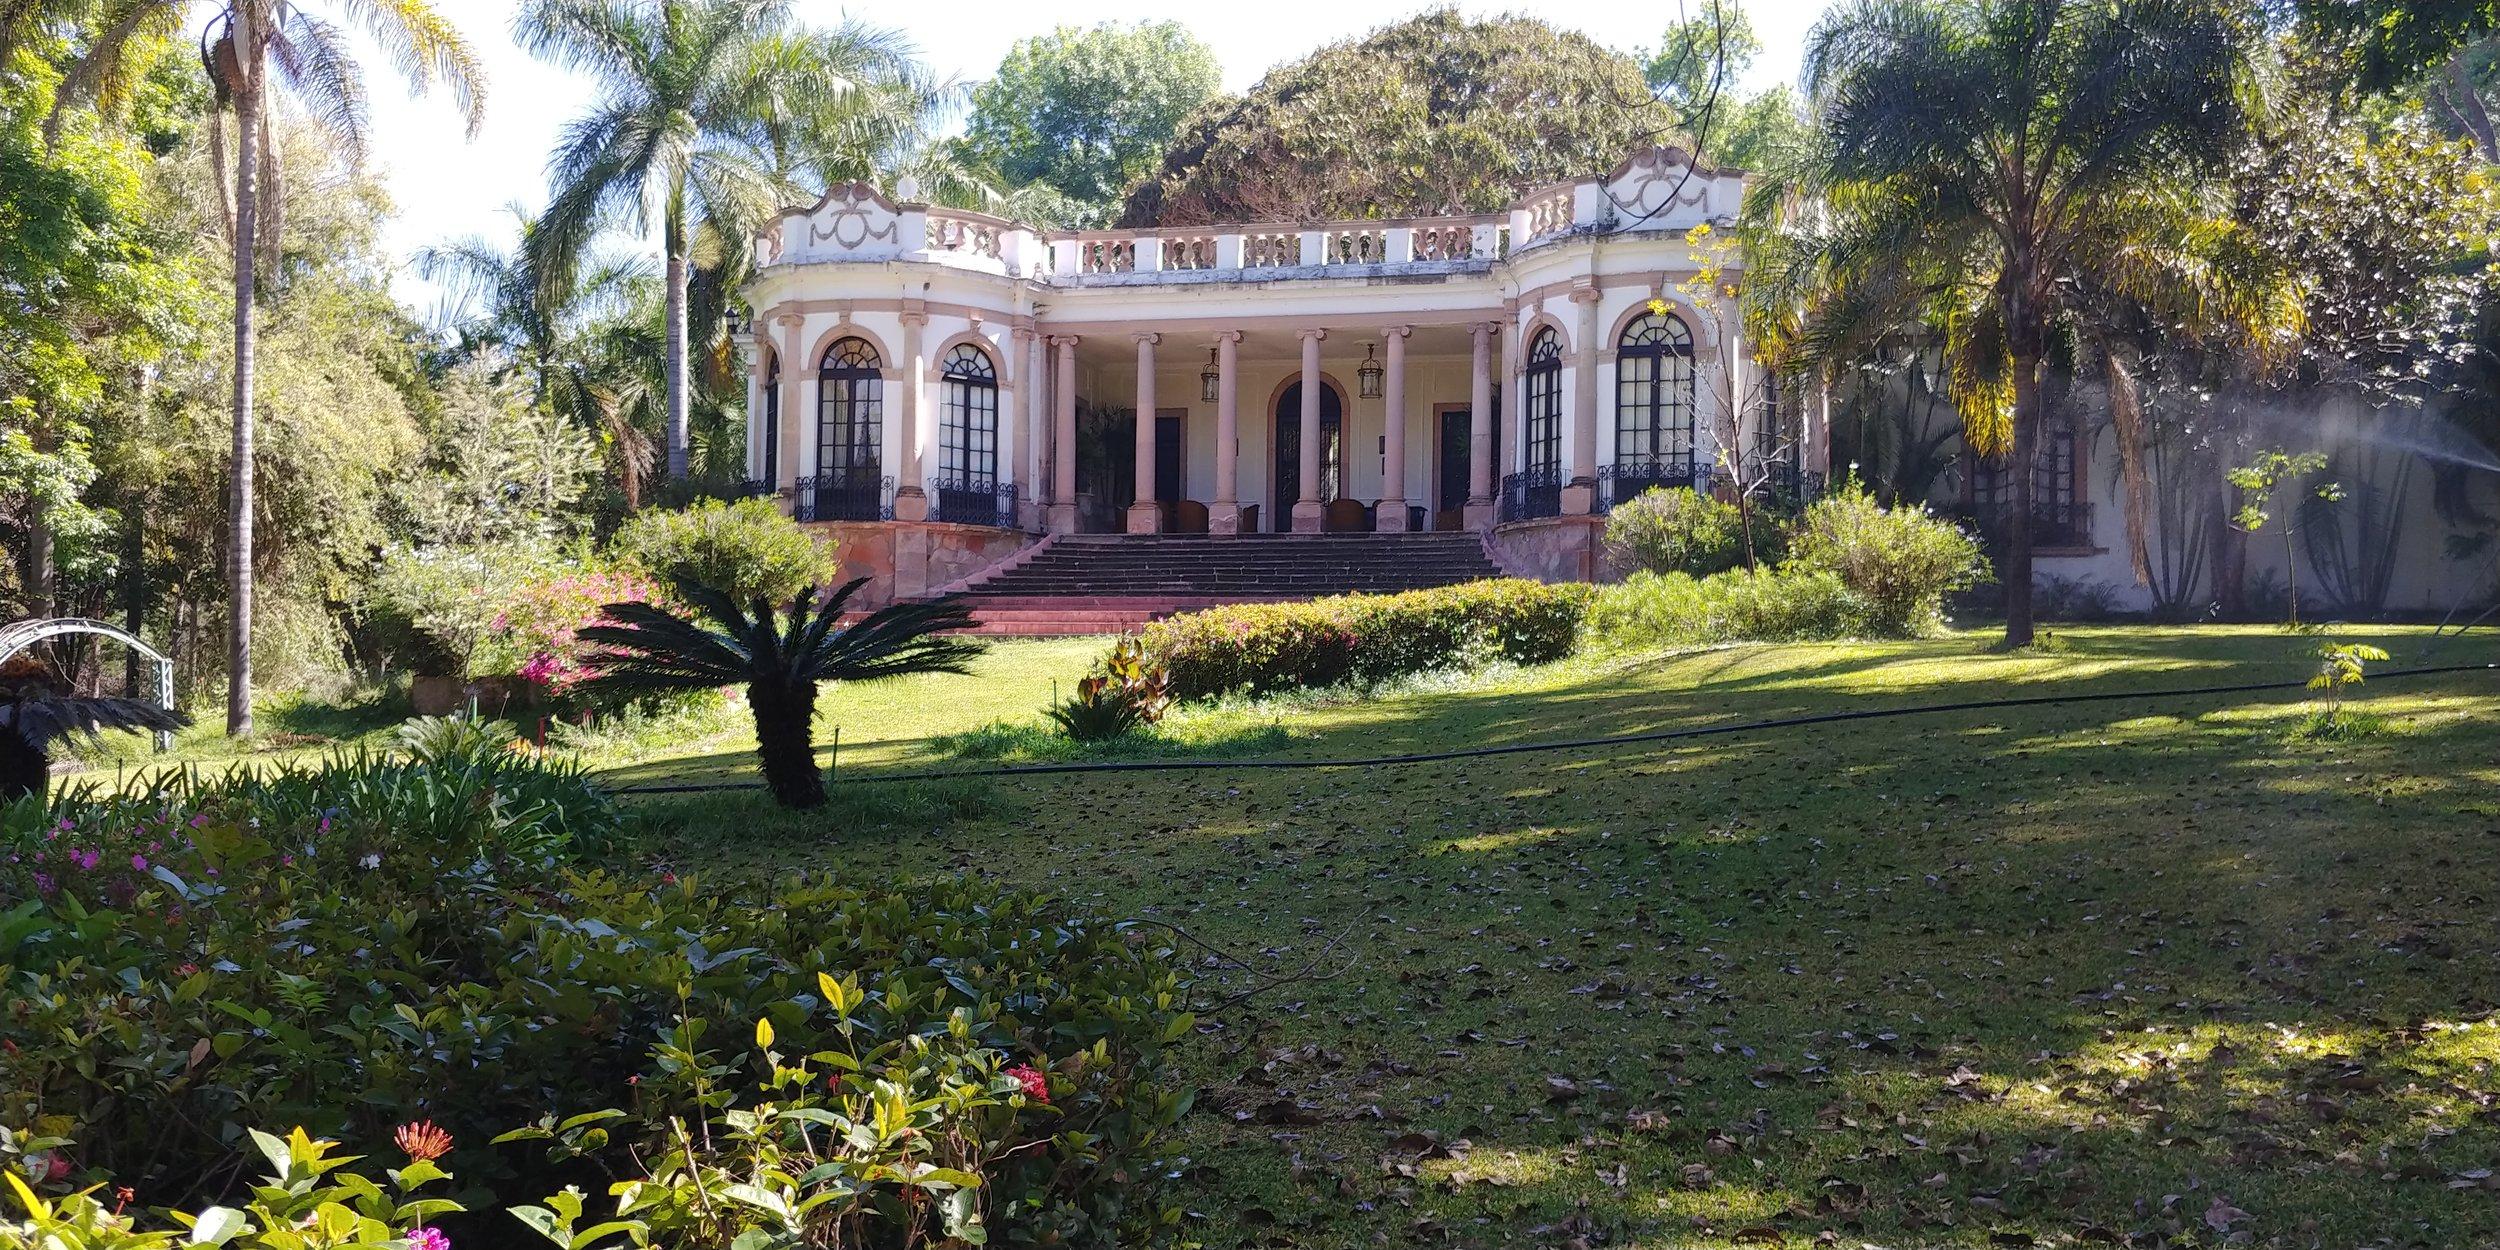 Hacienda San Diego